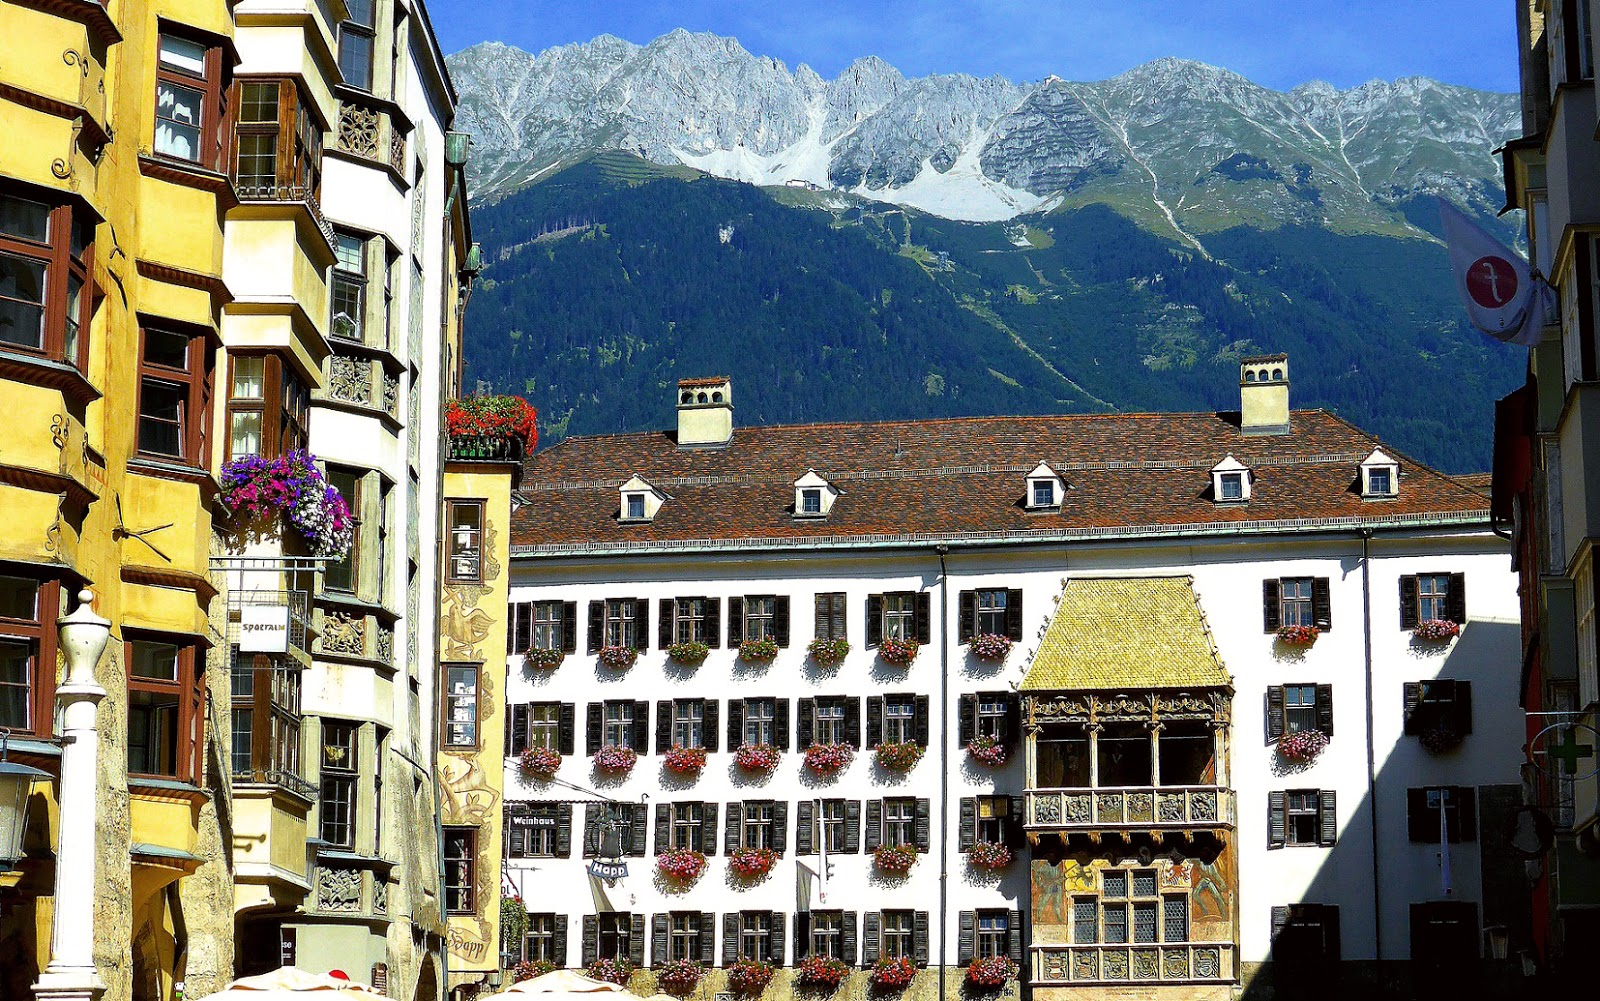 travel adventures tyrol tirol a voyage to tyrol austria sterreich europe. Black Bedroom Furniture Sets. Home Design Ideas